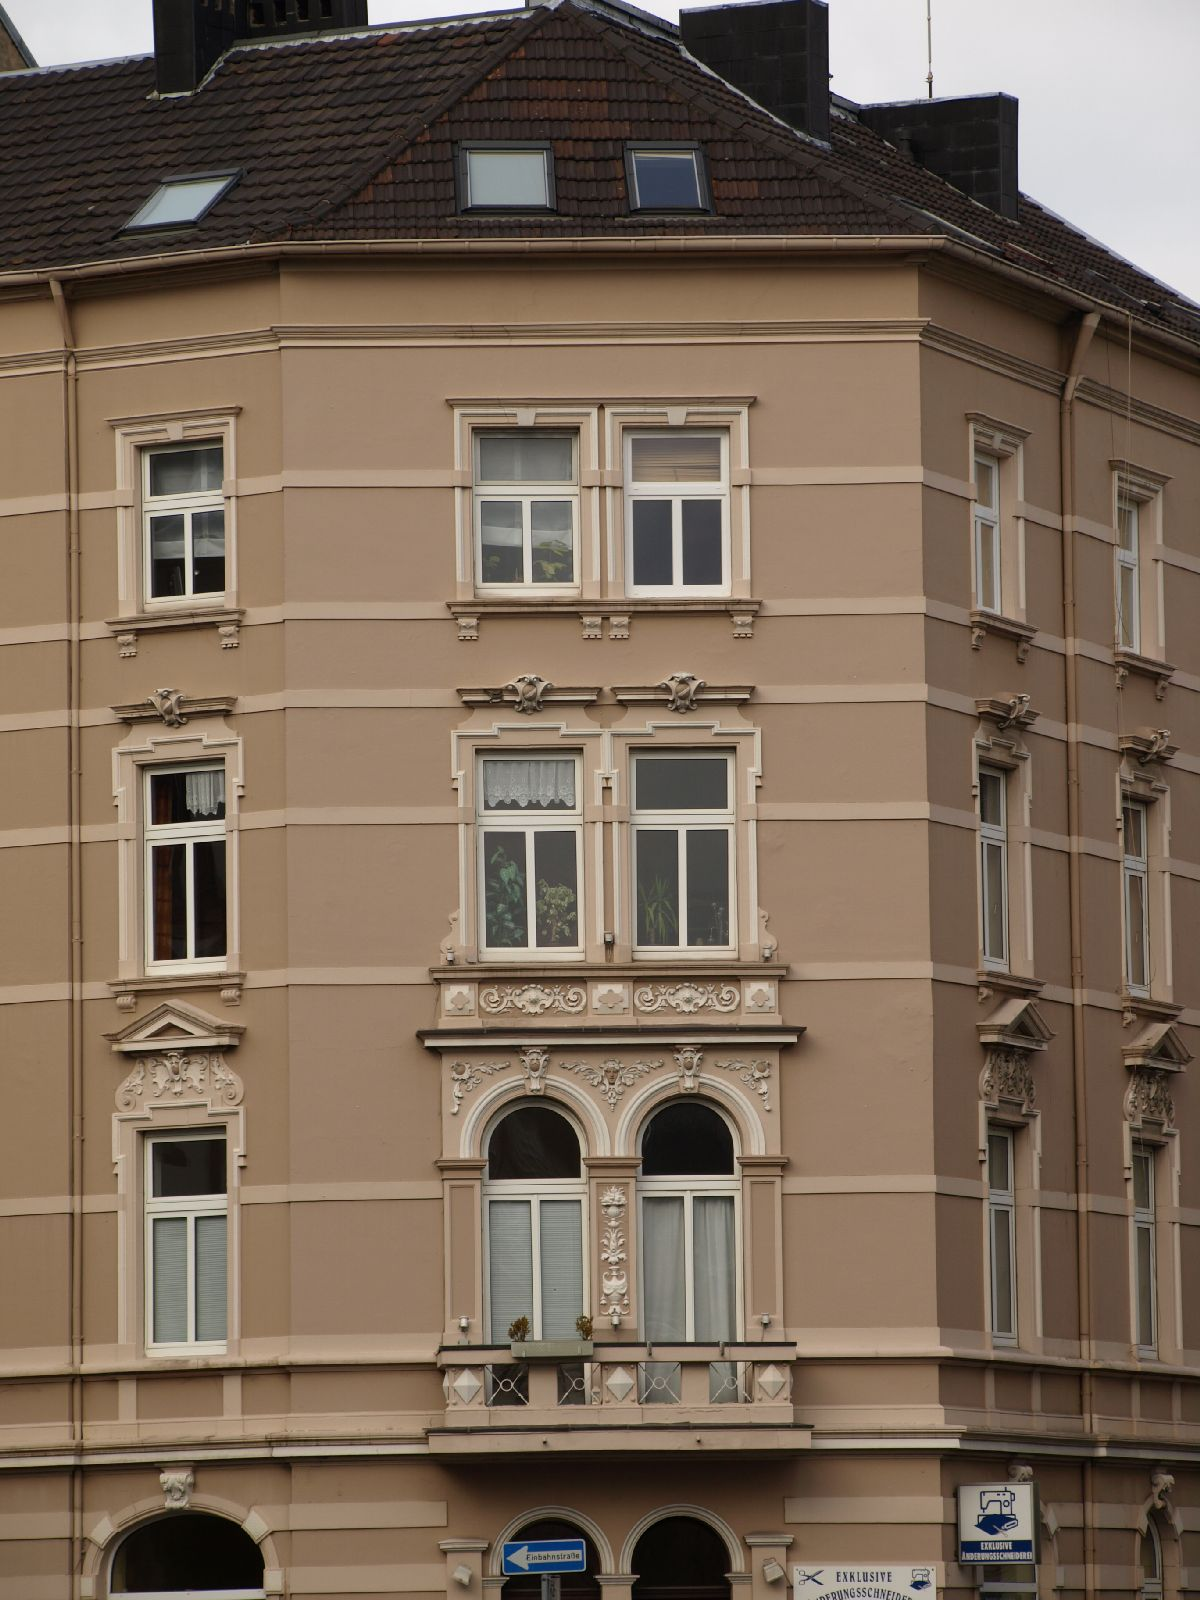 Building_Texture_A_PA039911